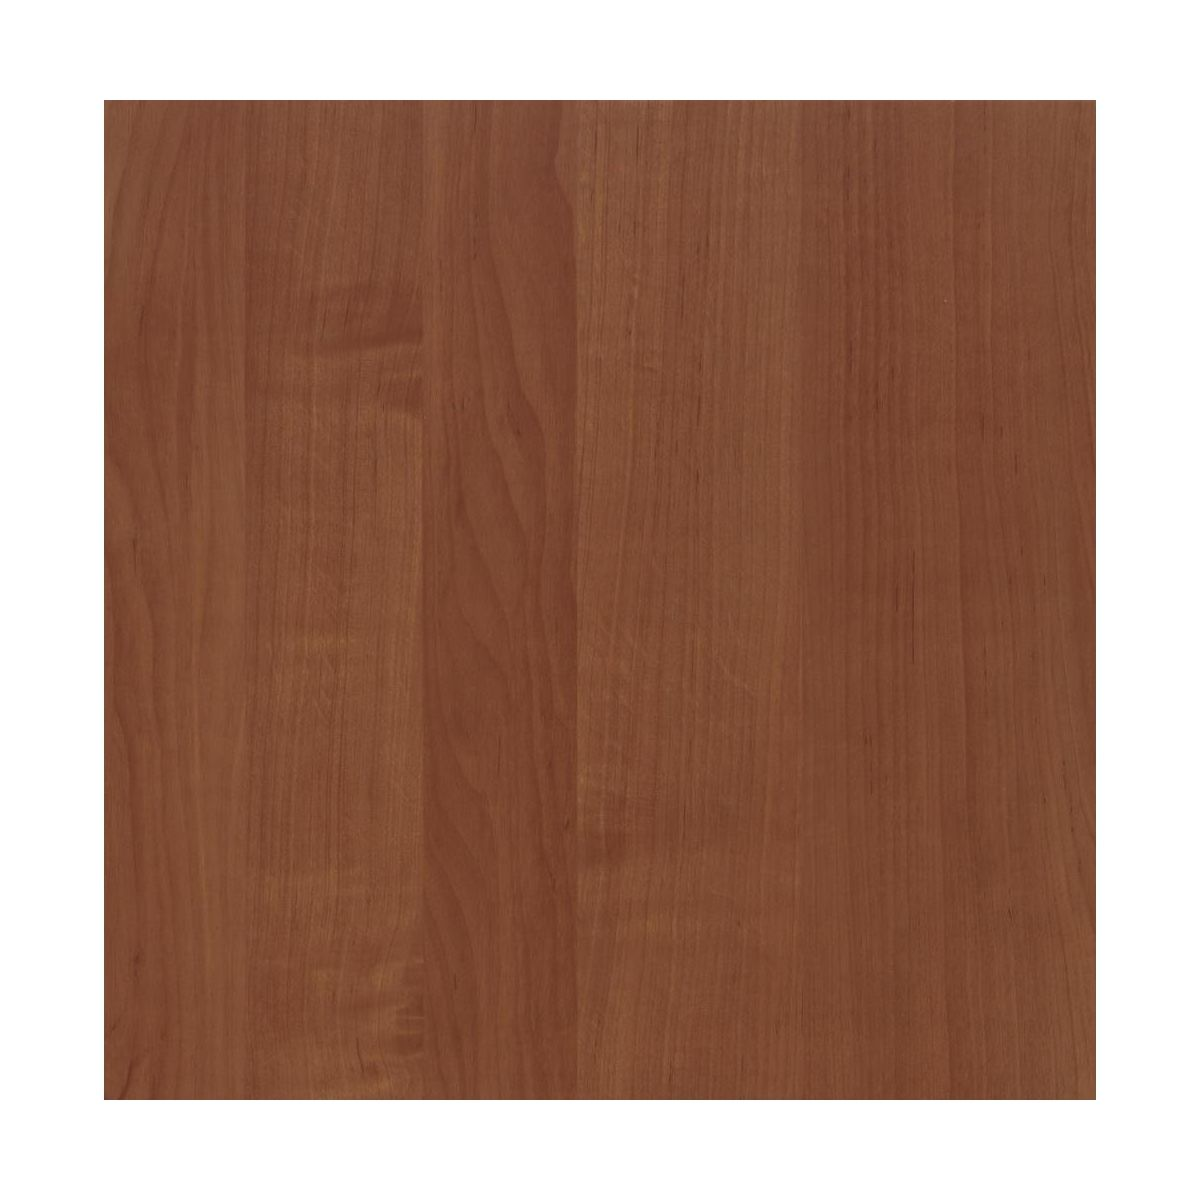 okleina peartree medium okleiny w atrakcyjnej cenie w. Black Bedroom Furniture Sets. Home Design Ideas